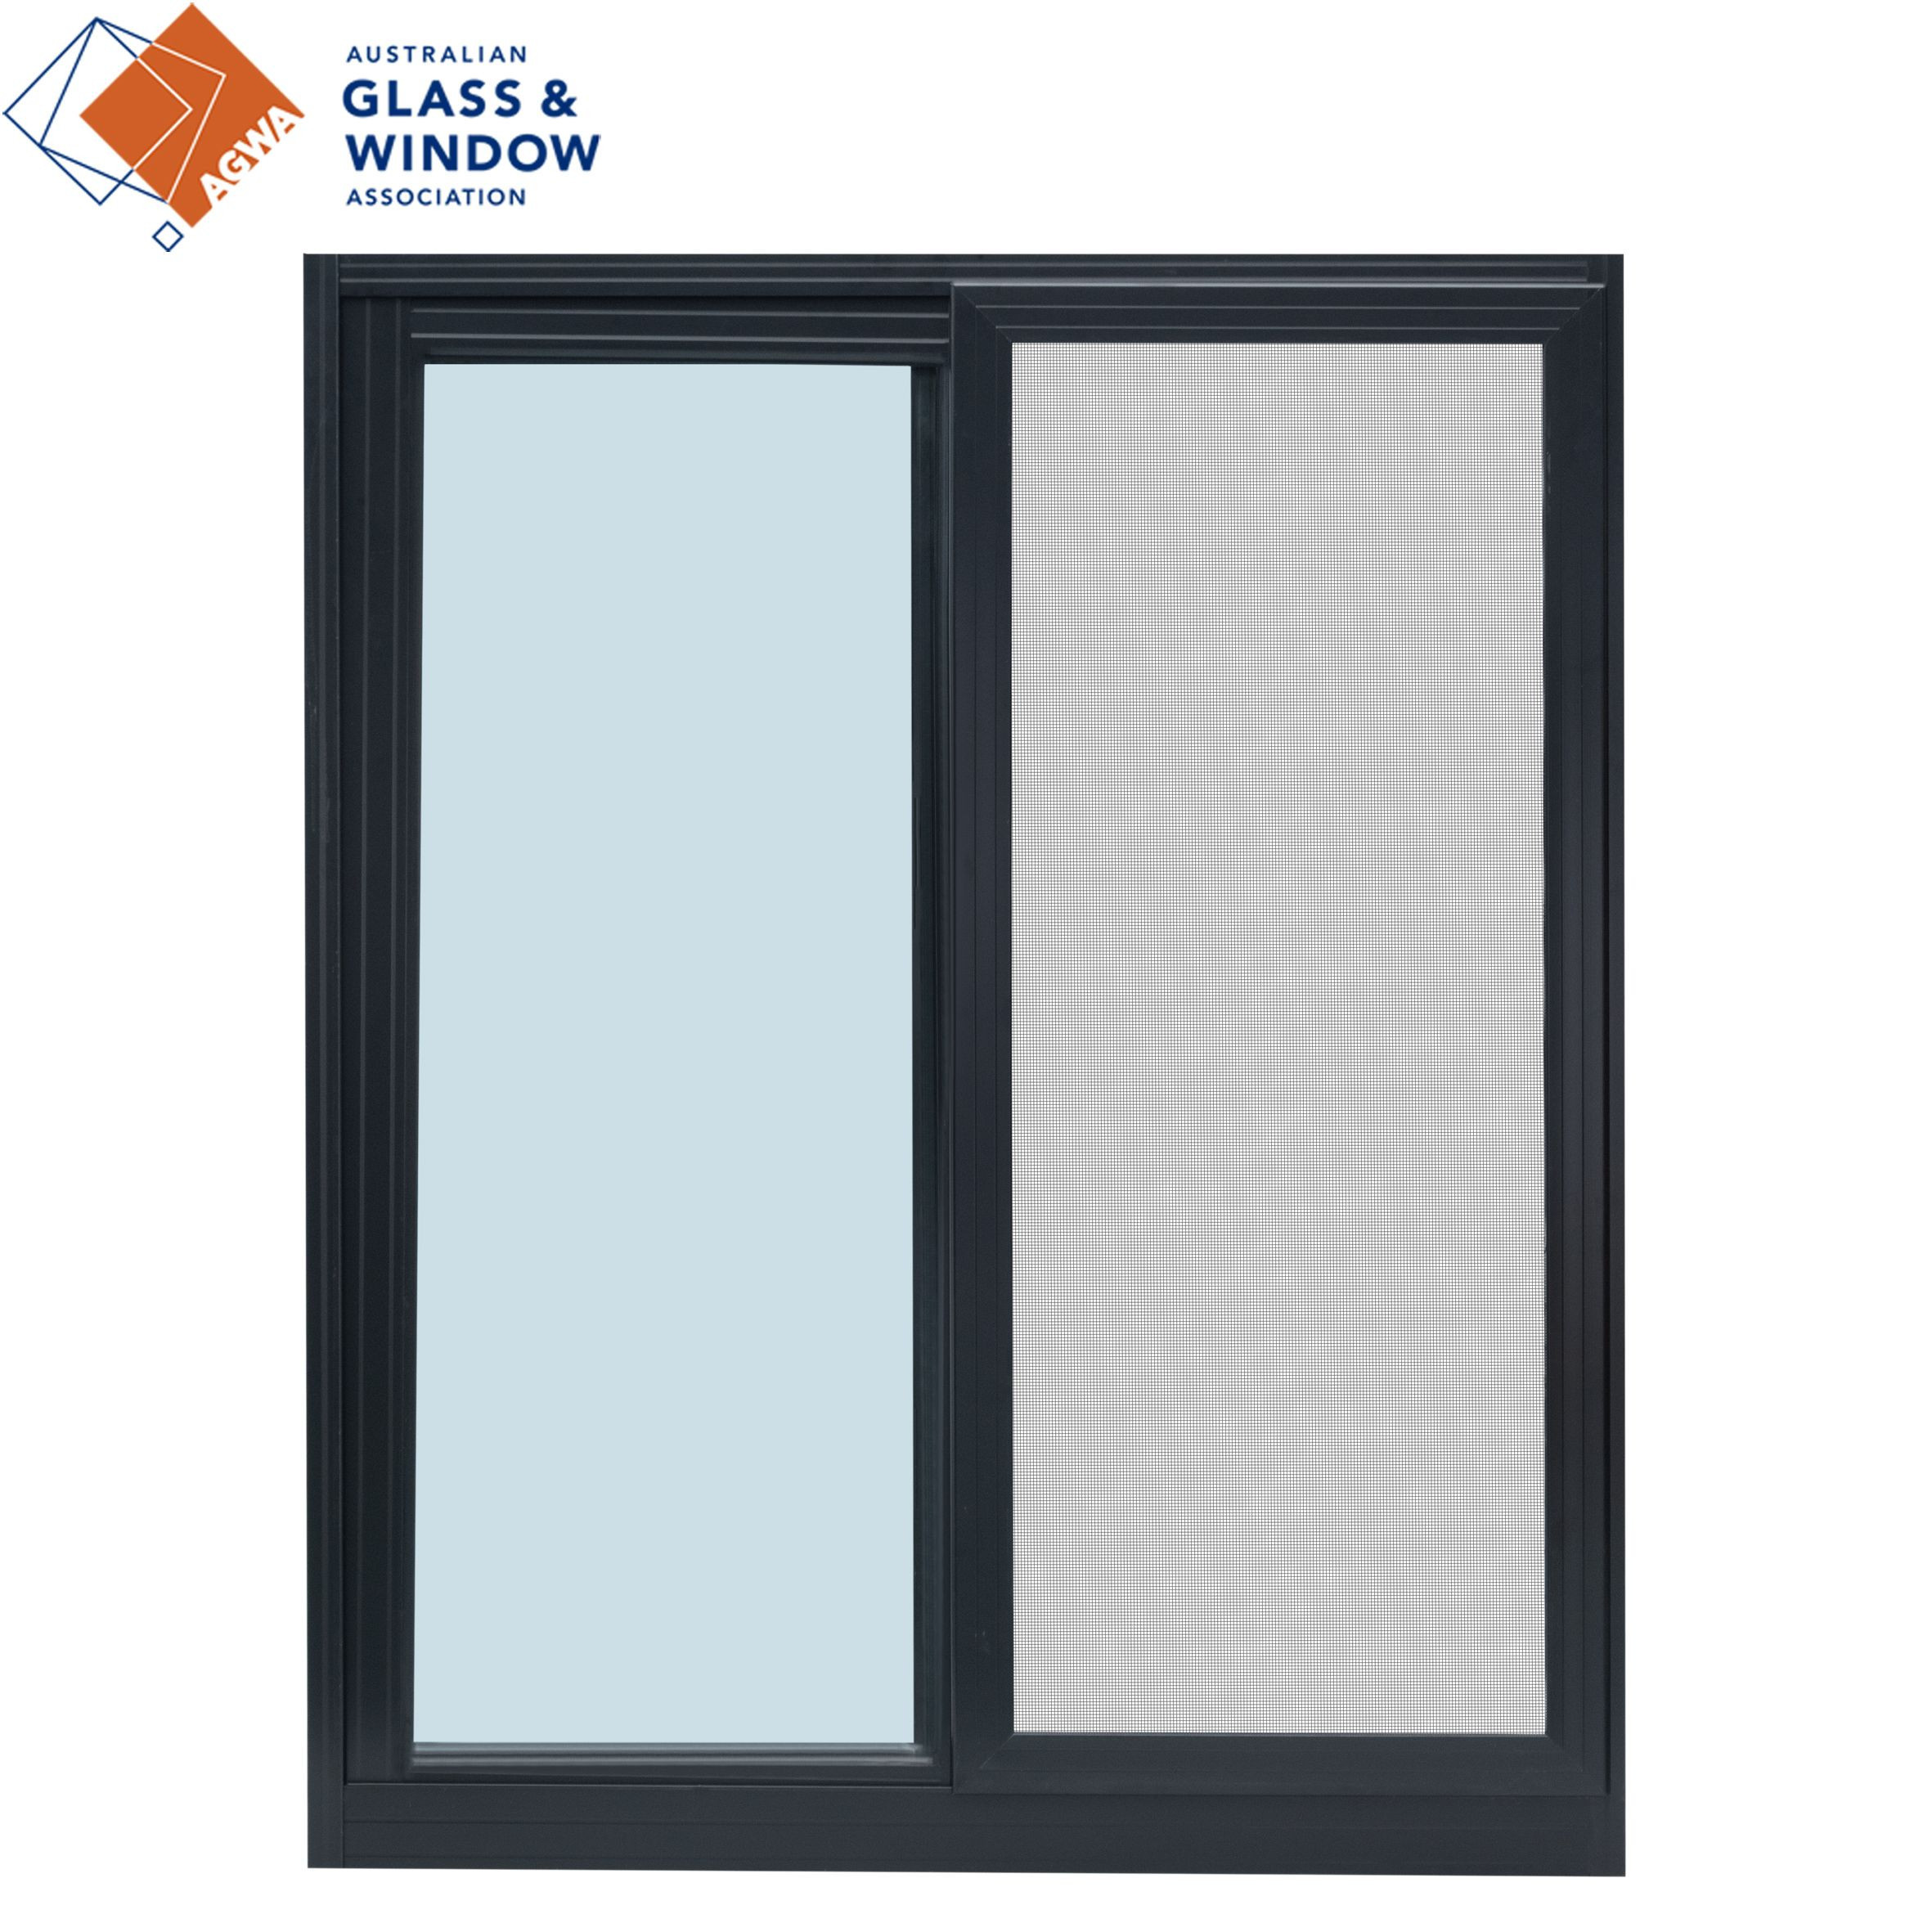 BARON Australian Glass & Window Association Australian Standards Double Glazed Aluminum Sliding Windows In Powder Coated Finish